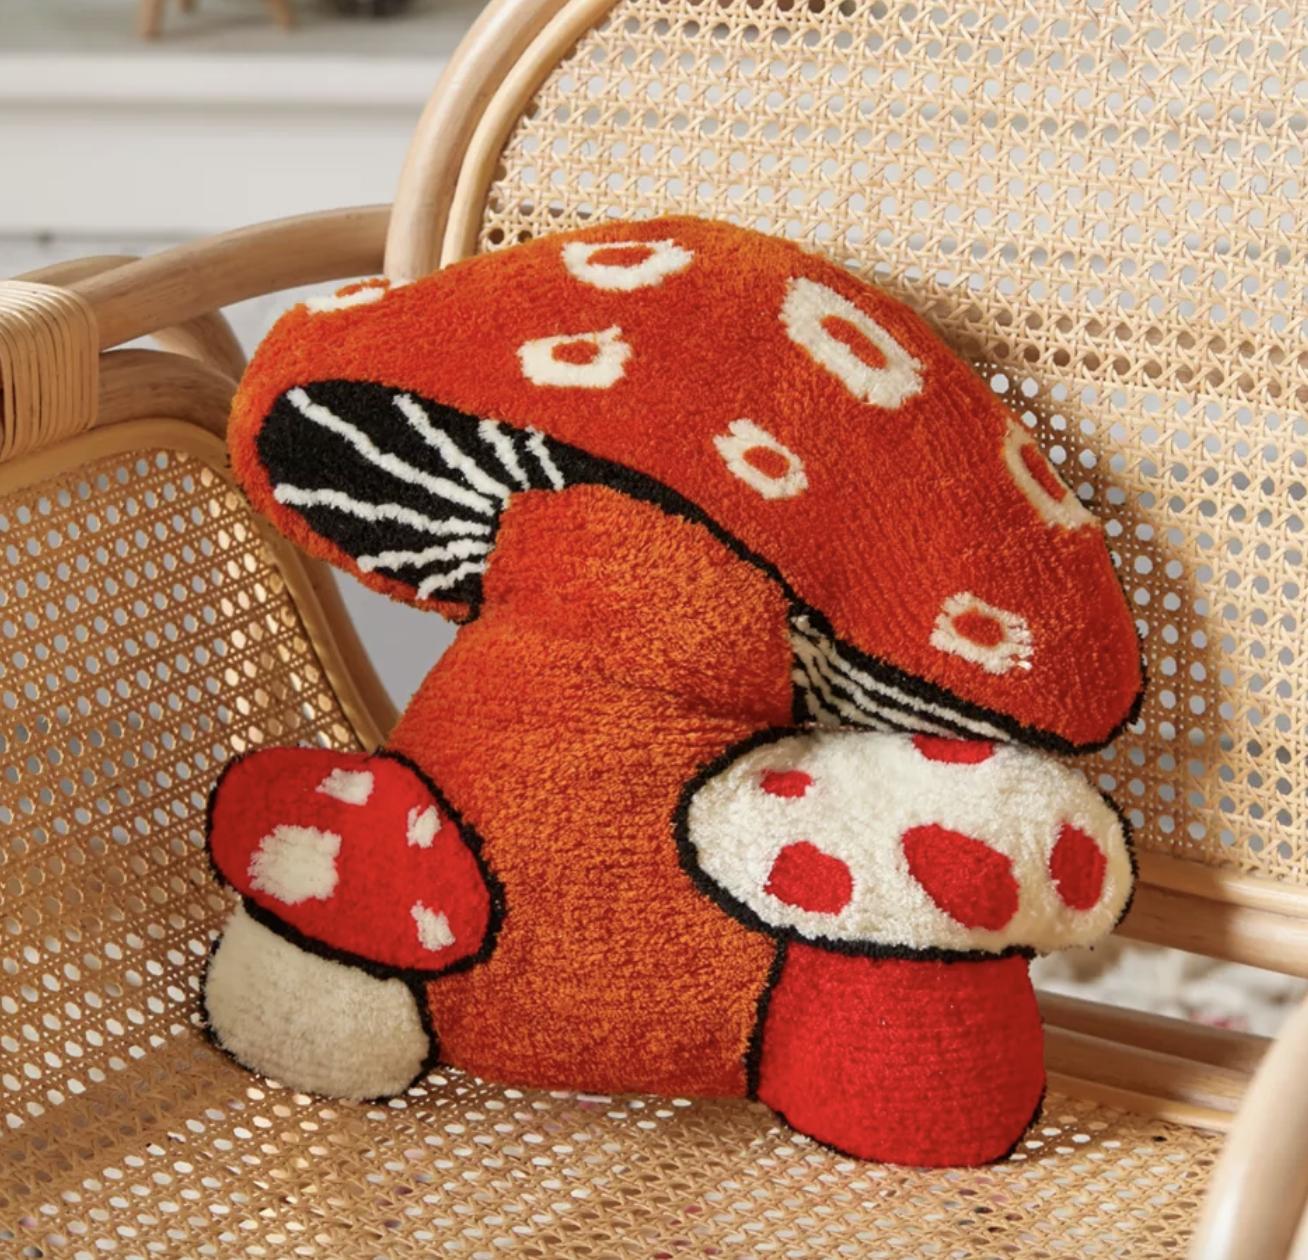 the mushroom pillow